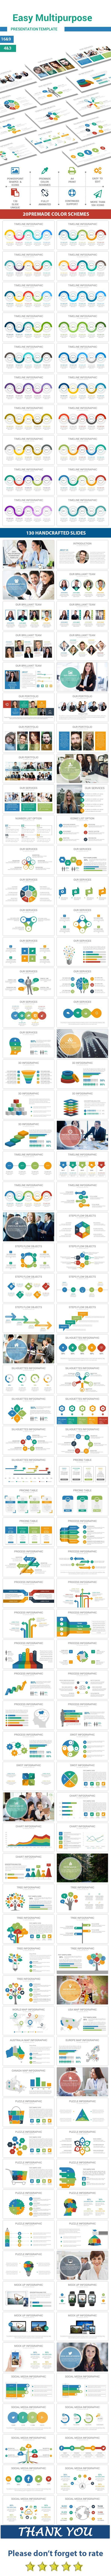 Easy Multipurpose PowerPoint #Presentation Template - #PowerPoint Templates Presentation Templates